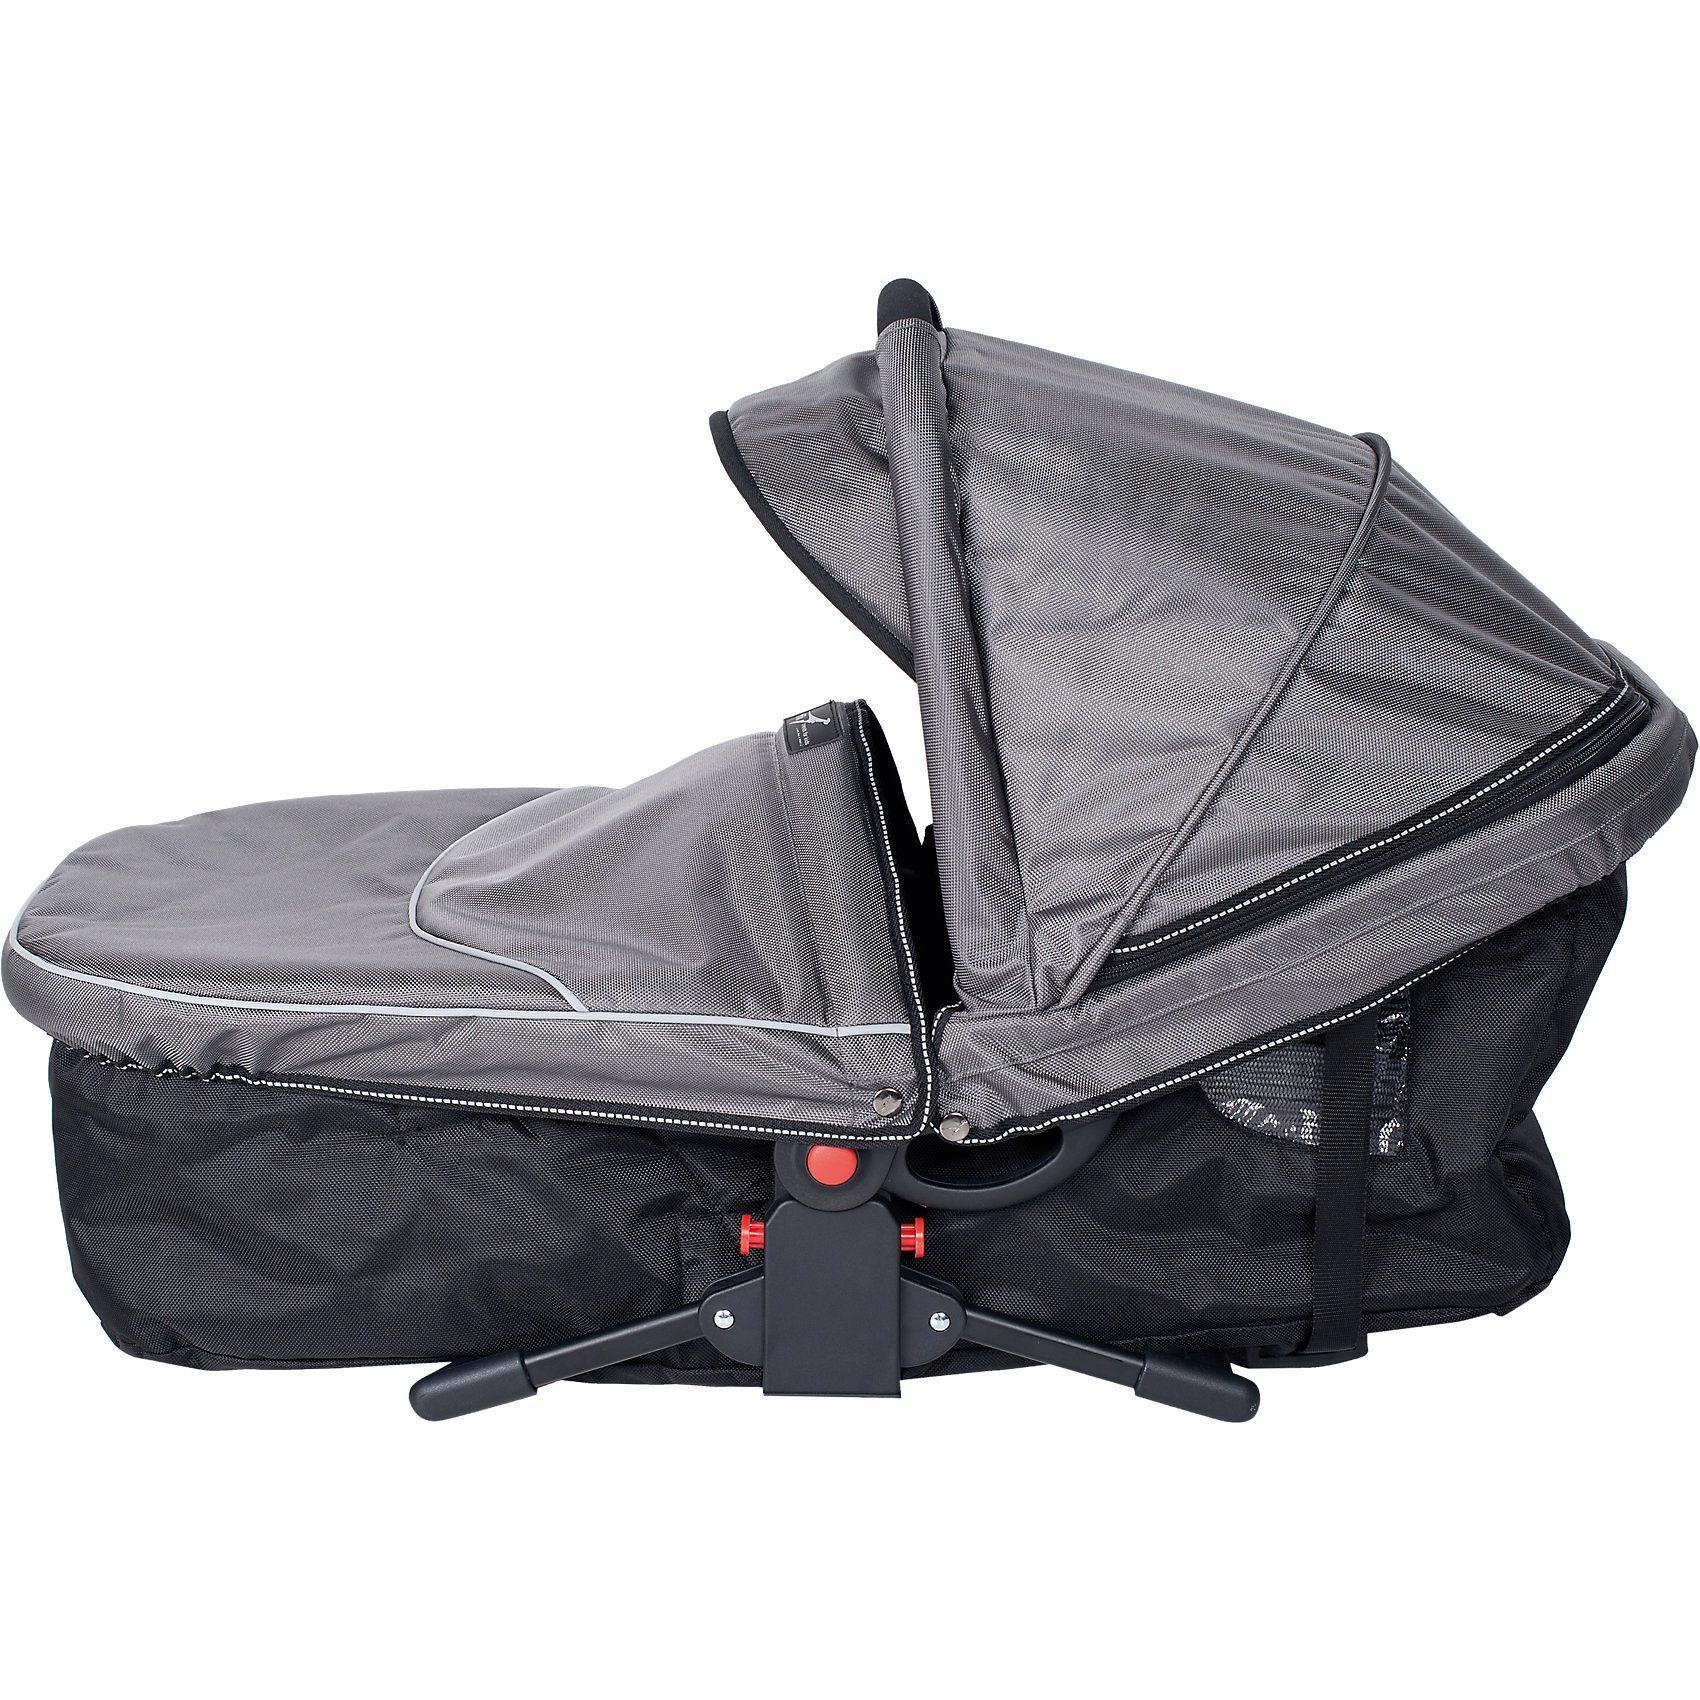 TFK Kinderwagenaufsatz Multi X, grau